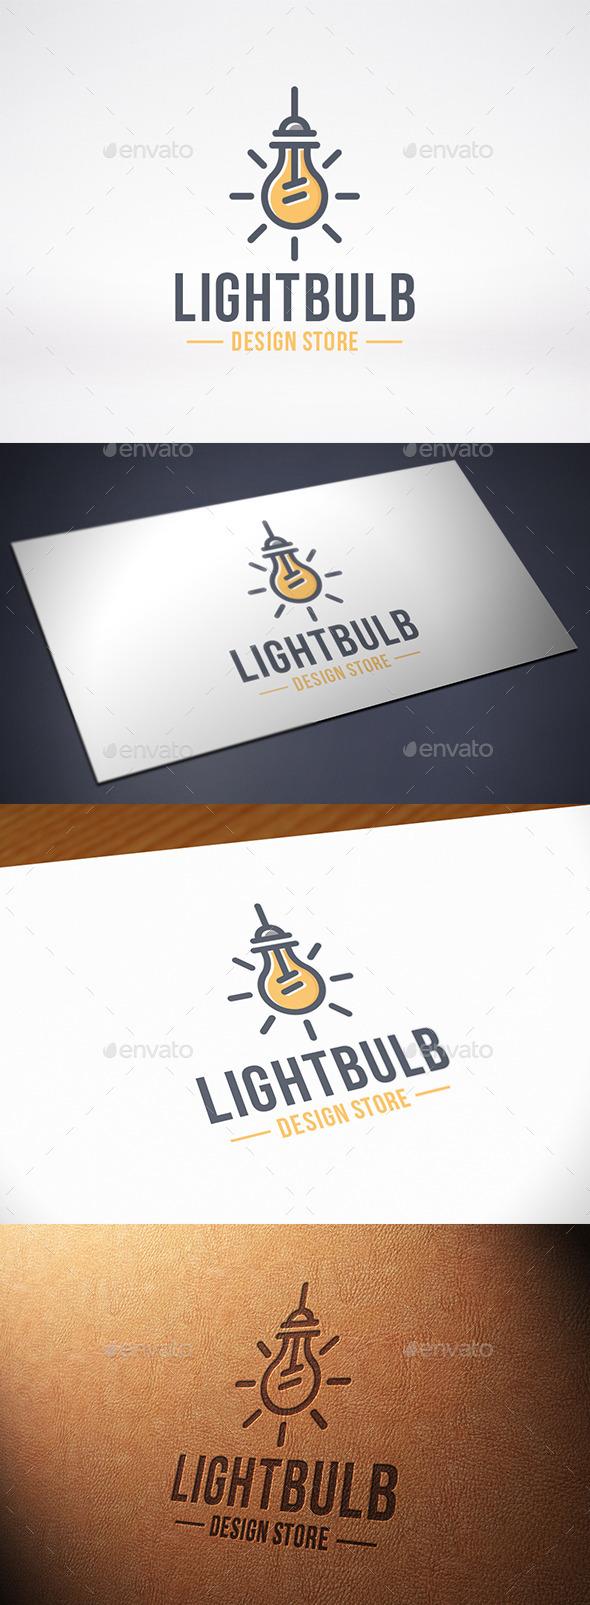 Idea Bulb Logo Template - Objects Logo Templates